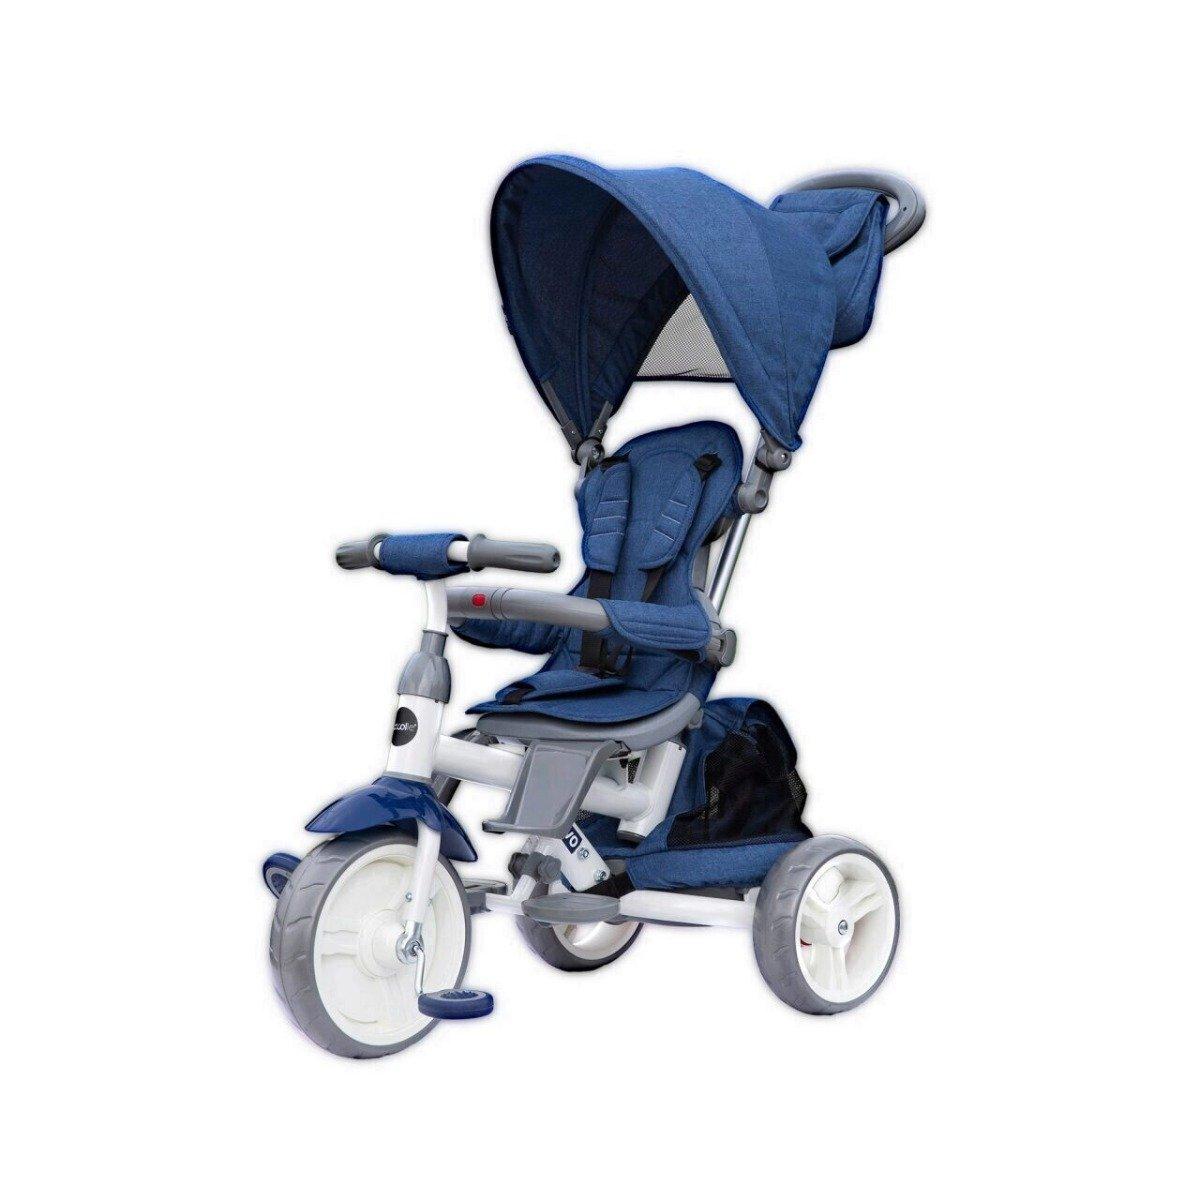 Tricicleta multifunctionala Evo Coccolle, Albastru